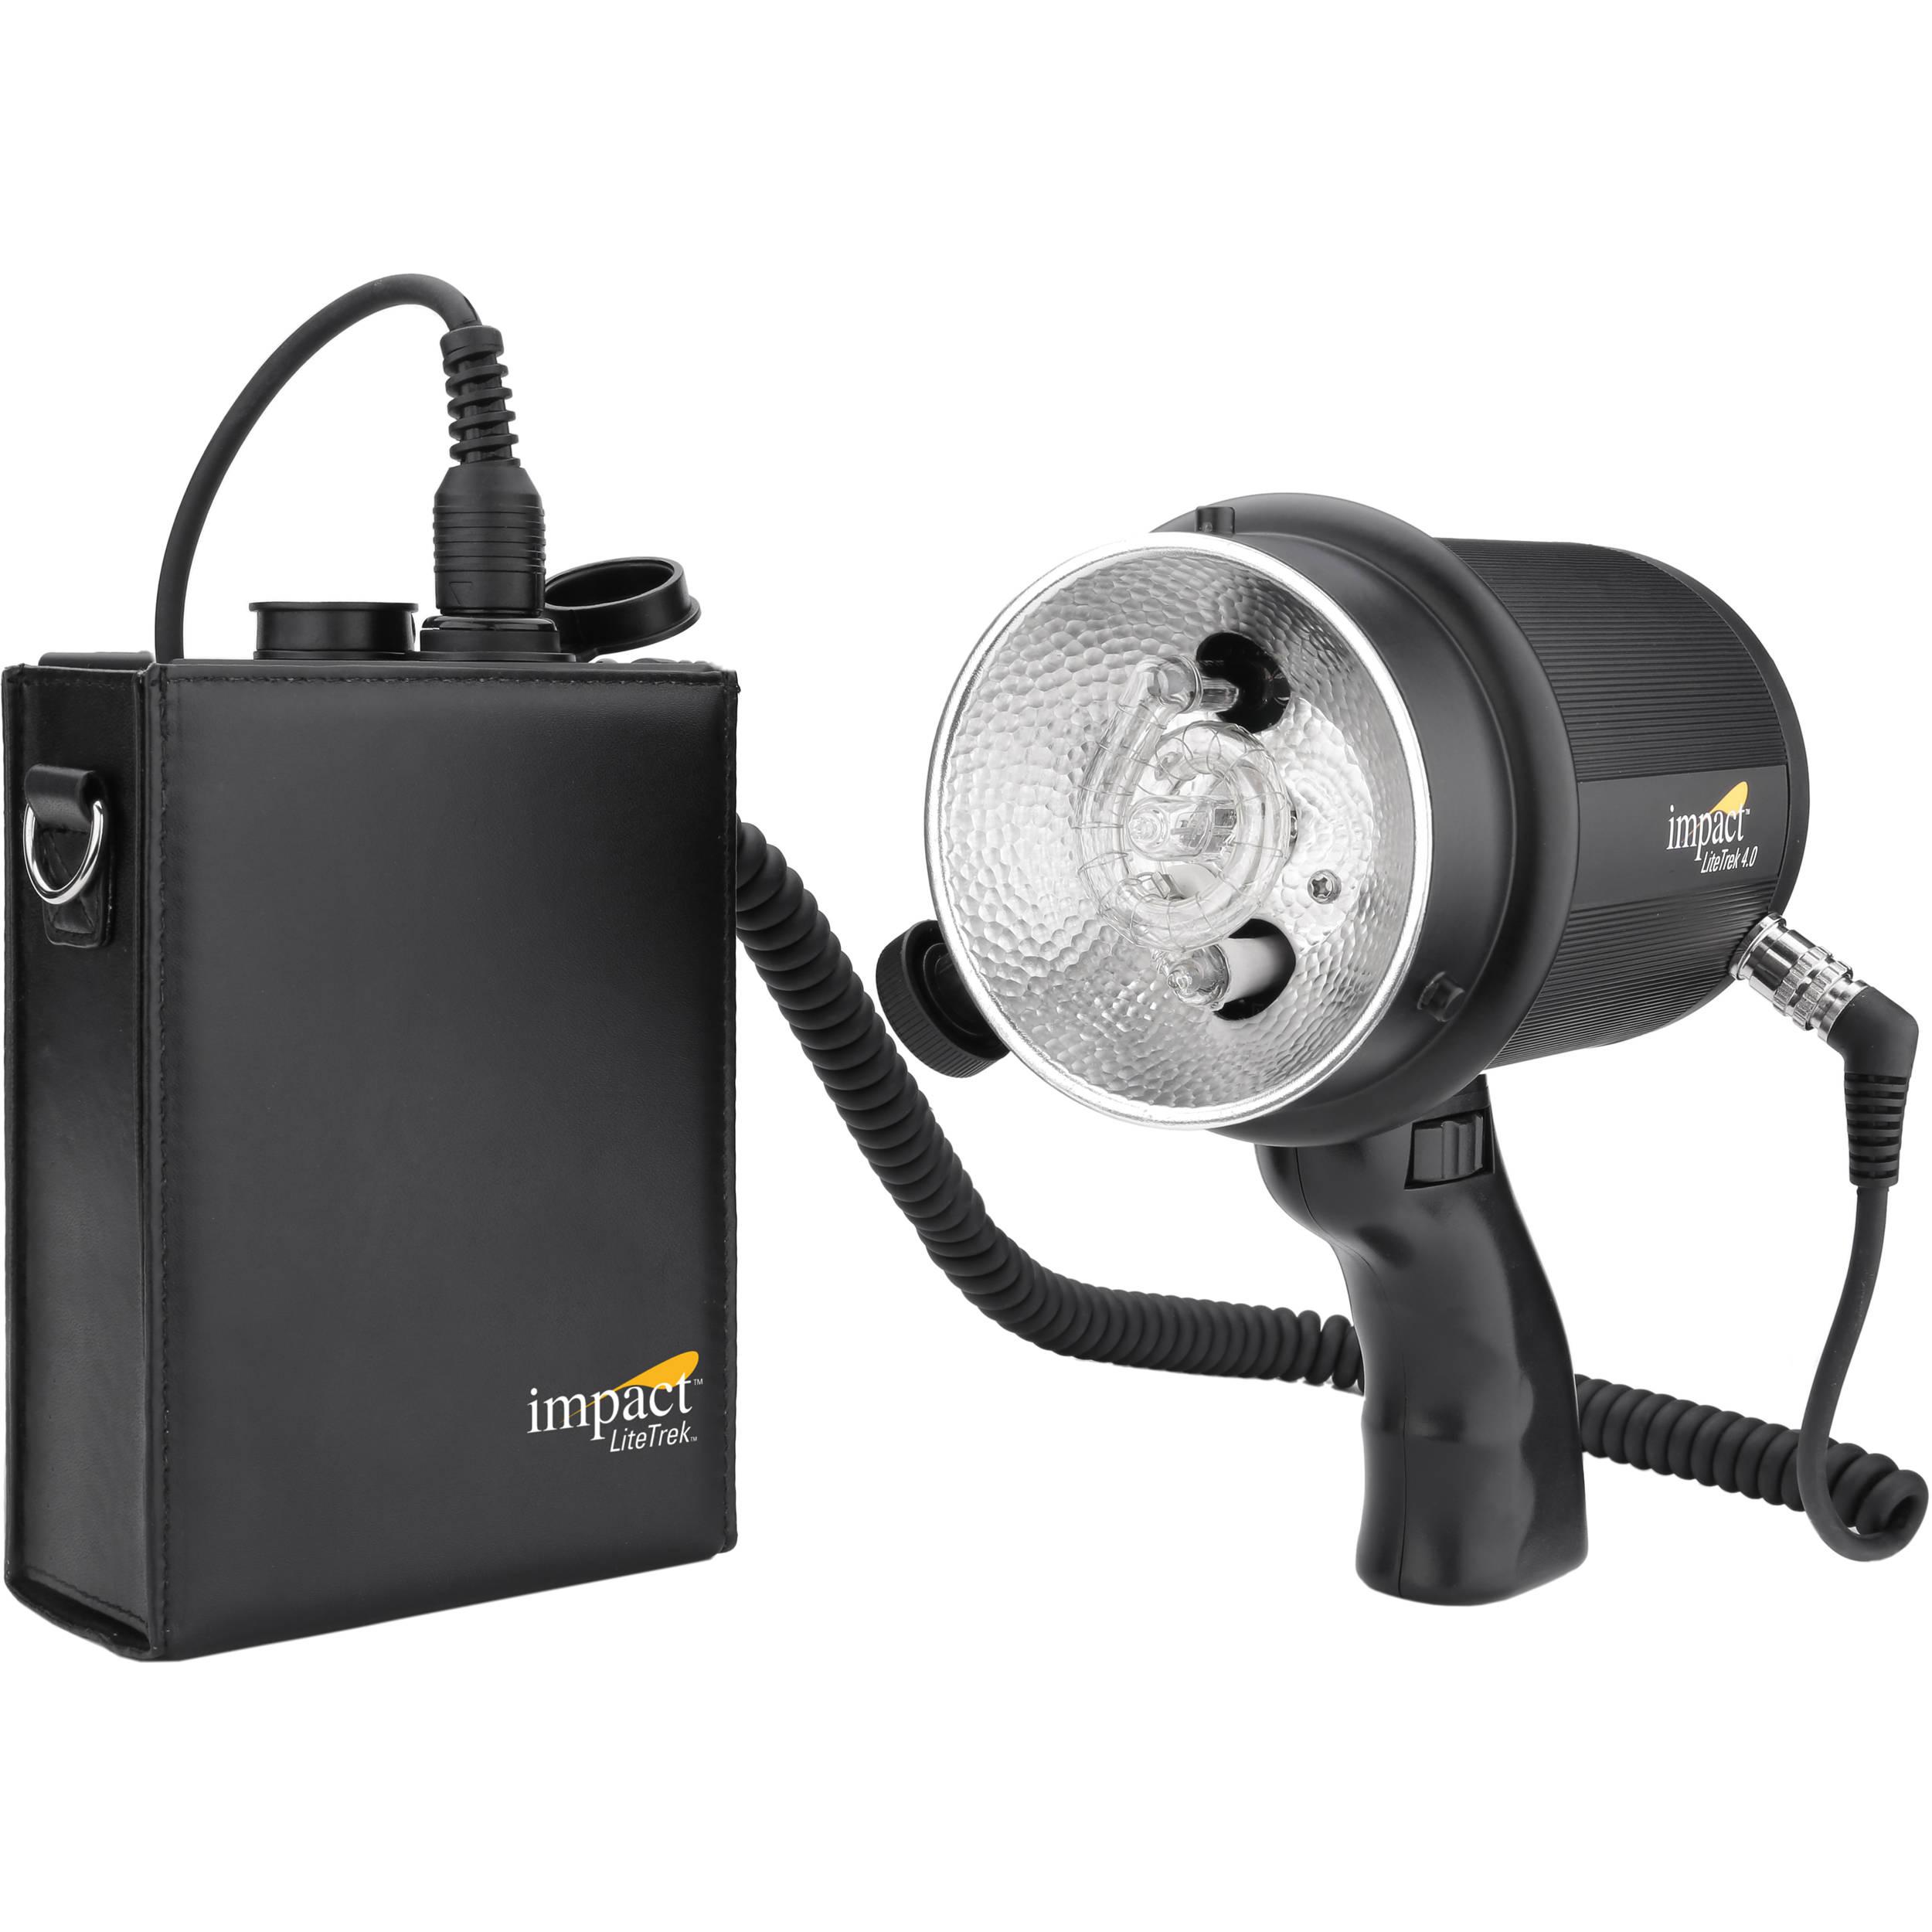 impact litetrek 4 0 dc monolight and mini litetrek lt 10052520